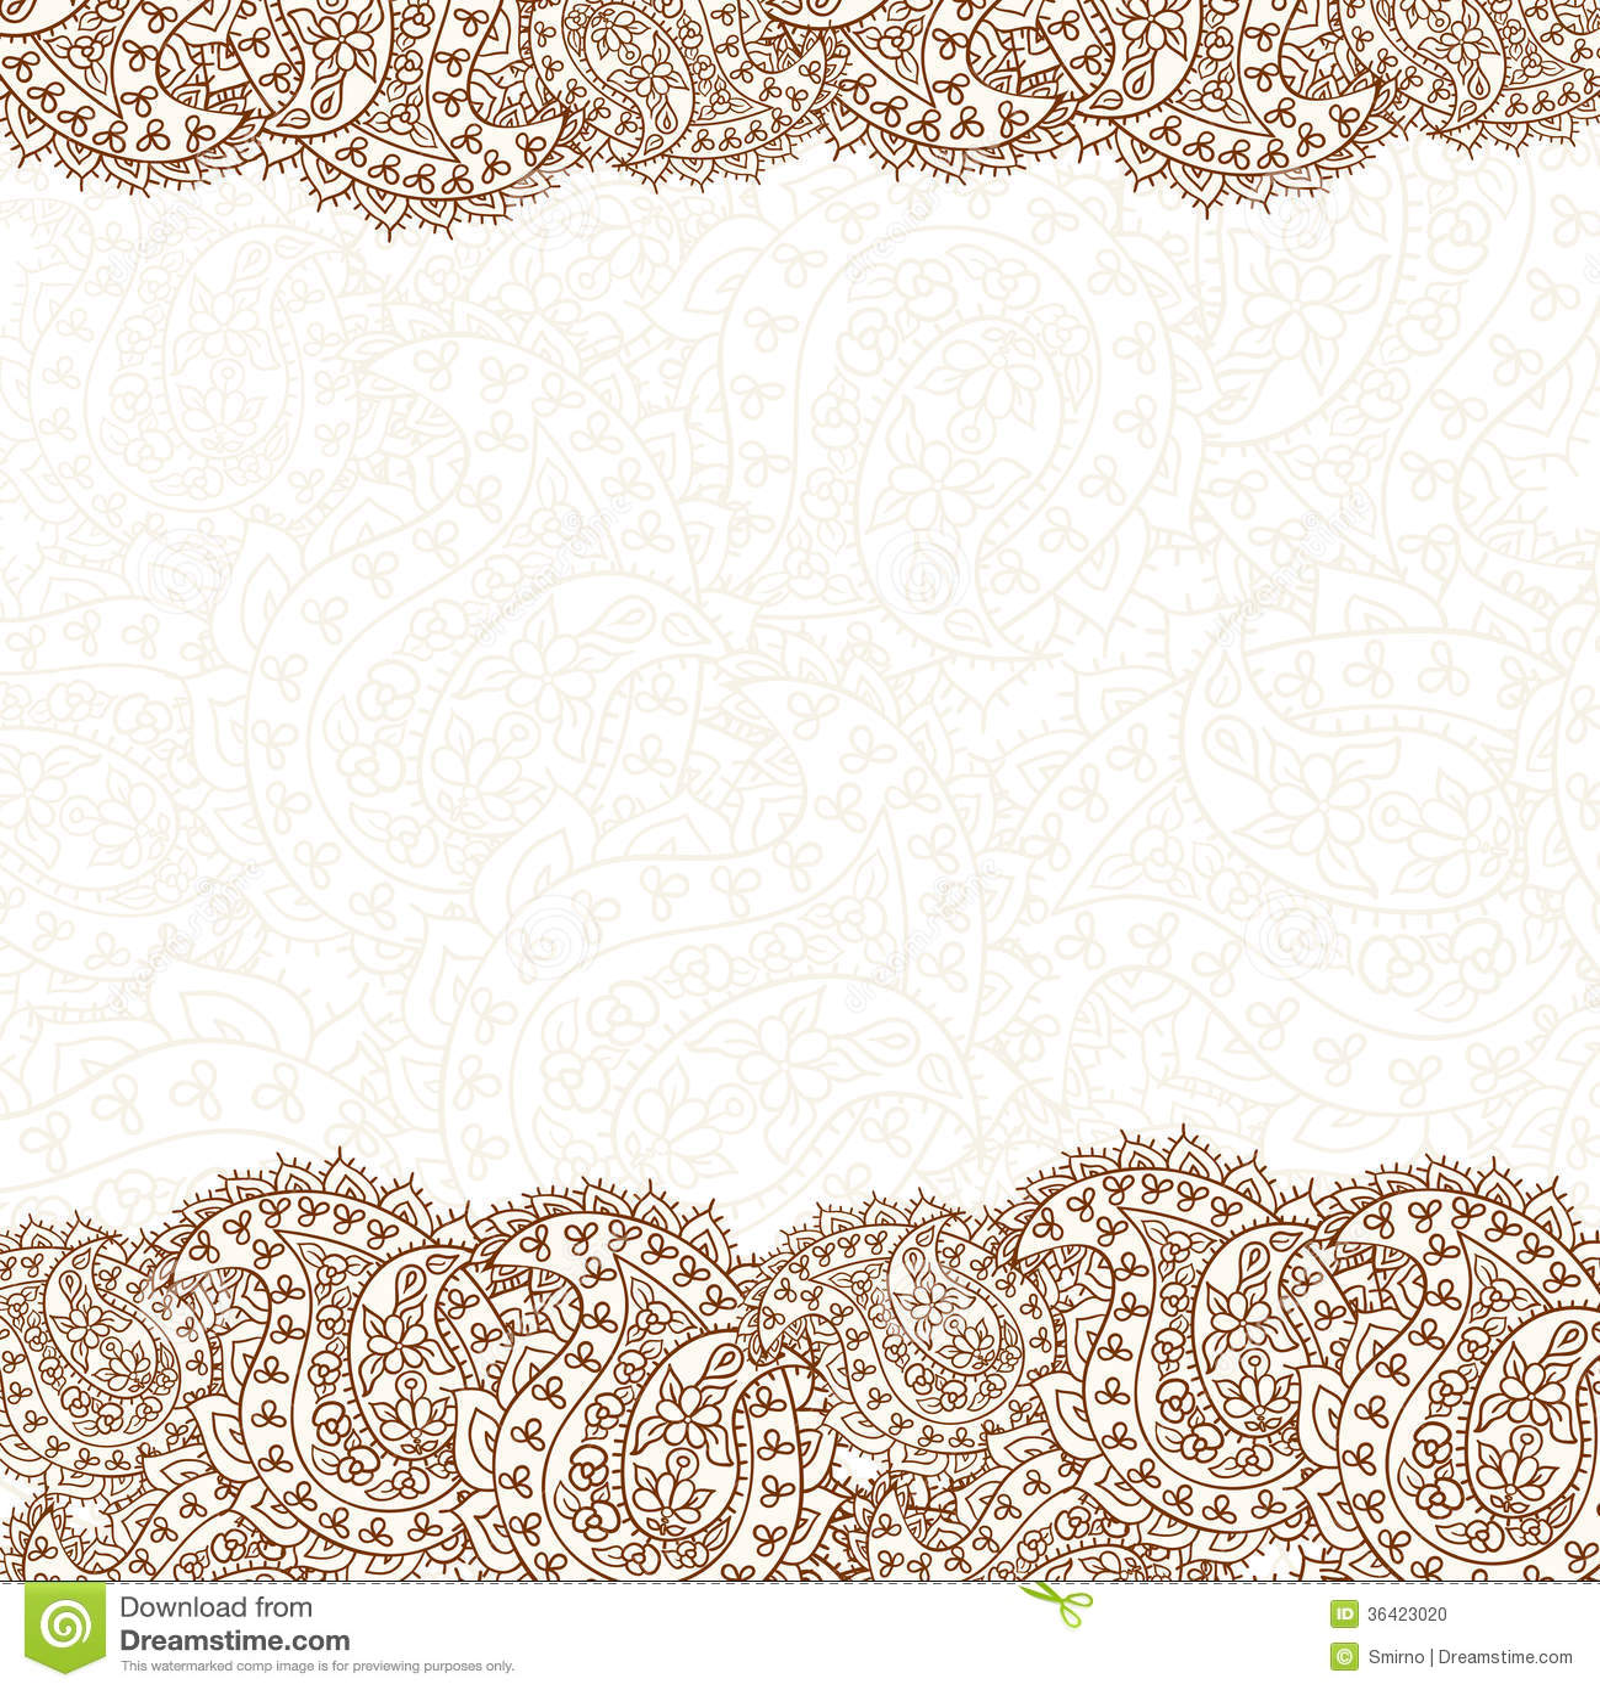 Hand-Drawn Henna Mehndi Abstract Pattern. Stock Photo - Image: 36423020